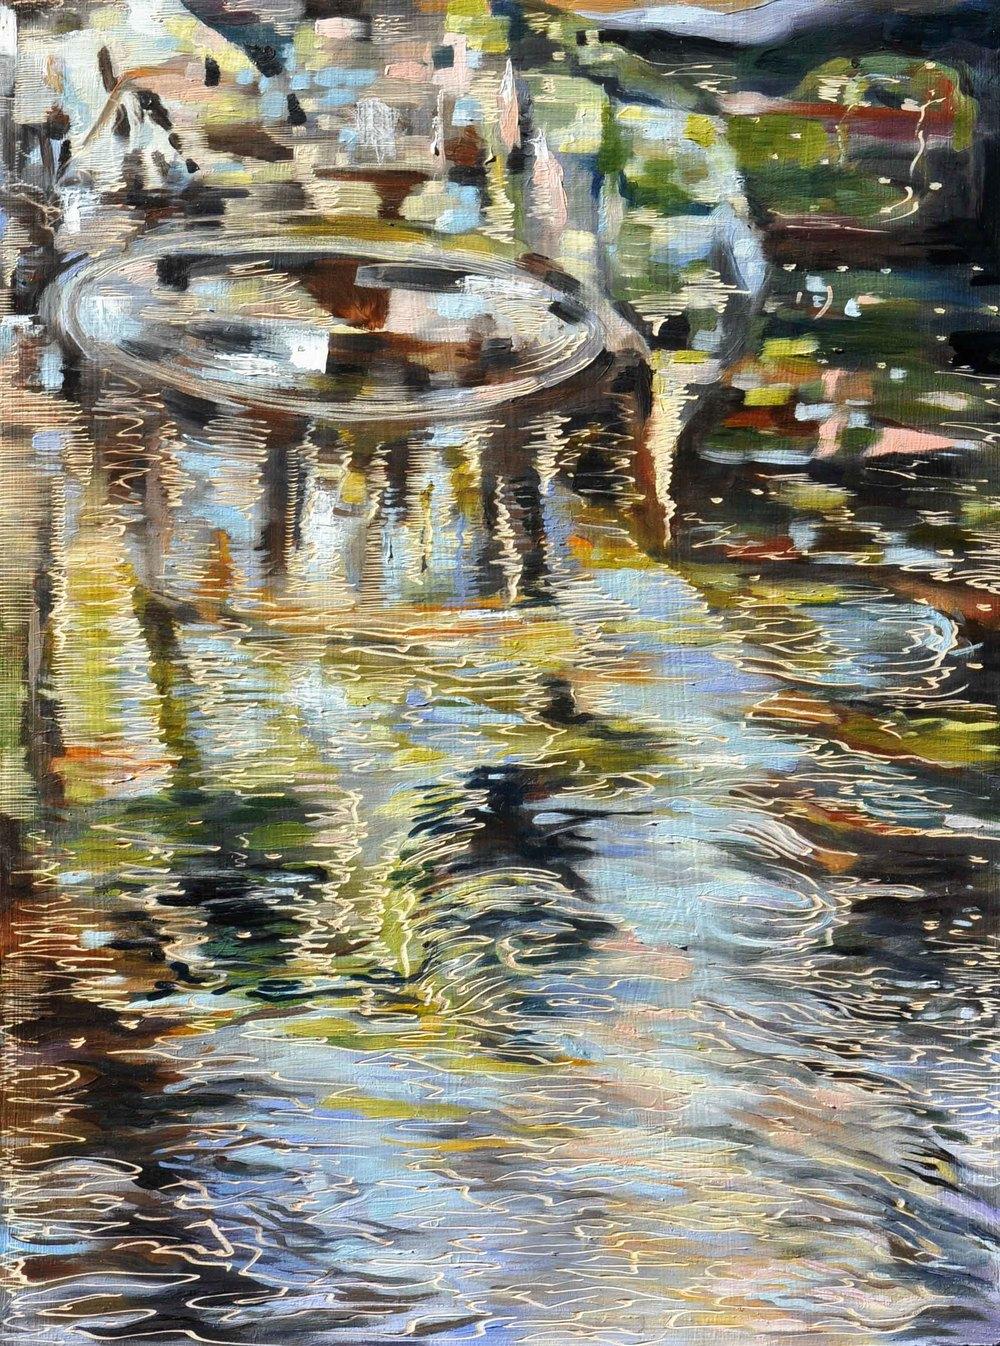 Title: Water Dancing - America Bay Creek